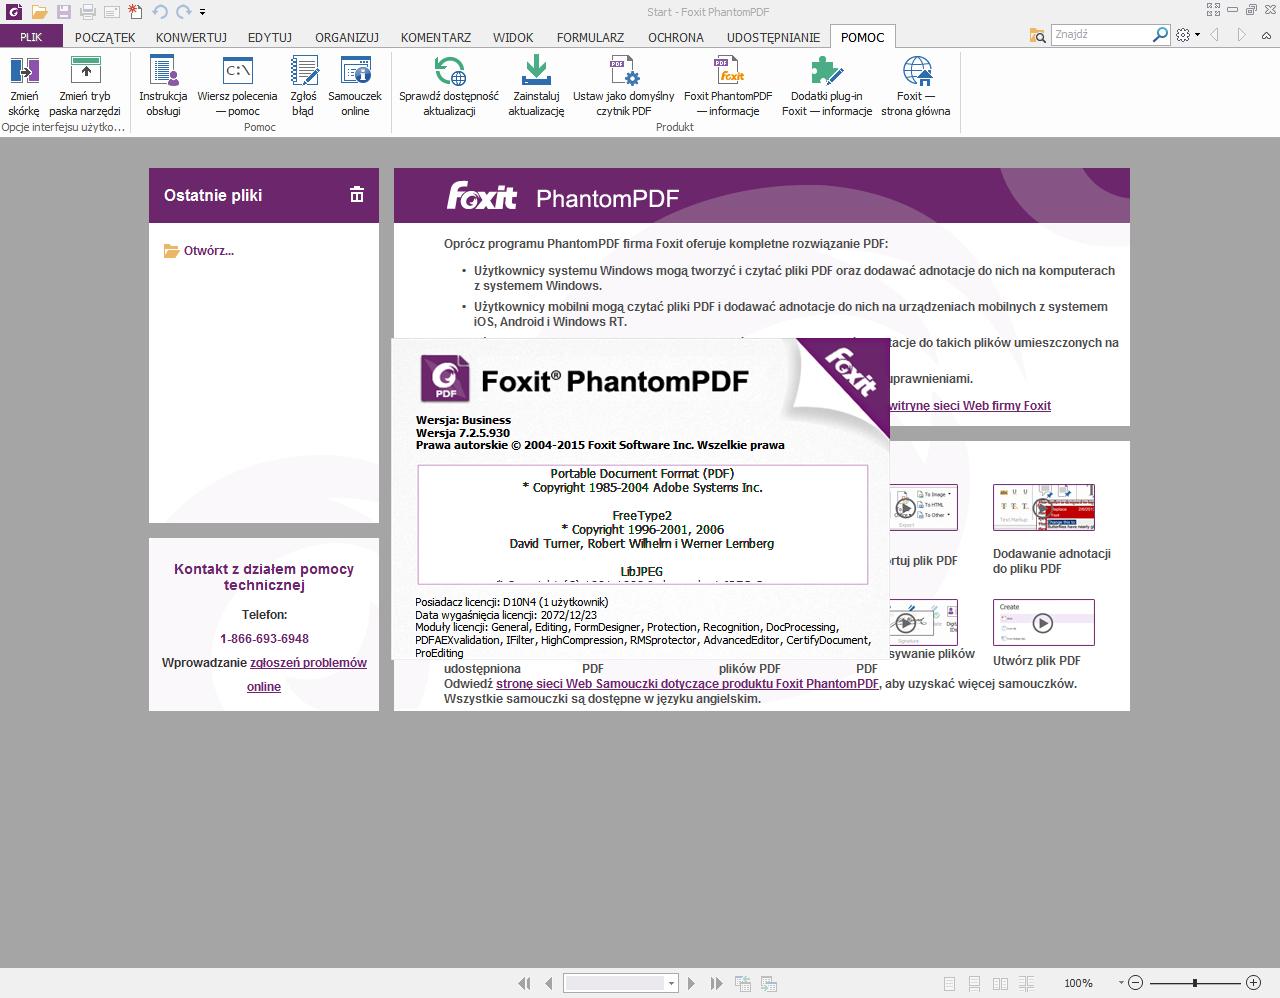 foxit phantompdf 8.3 patch